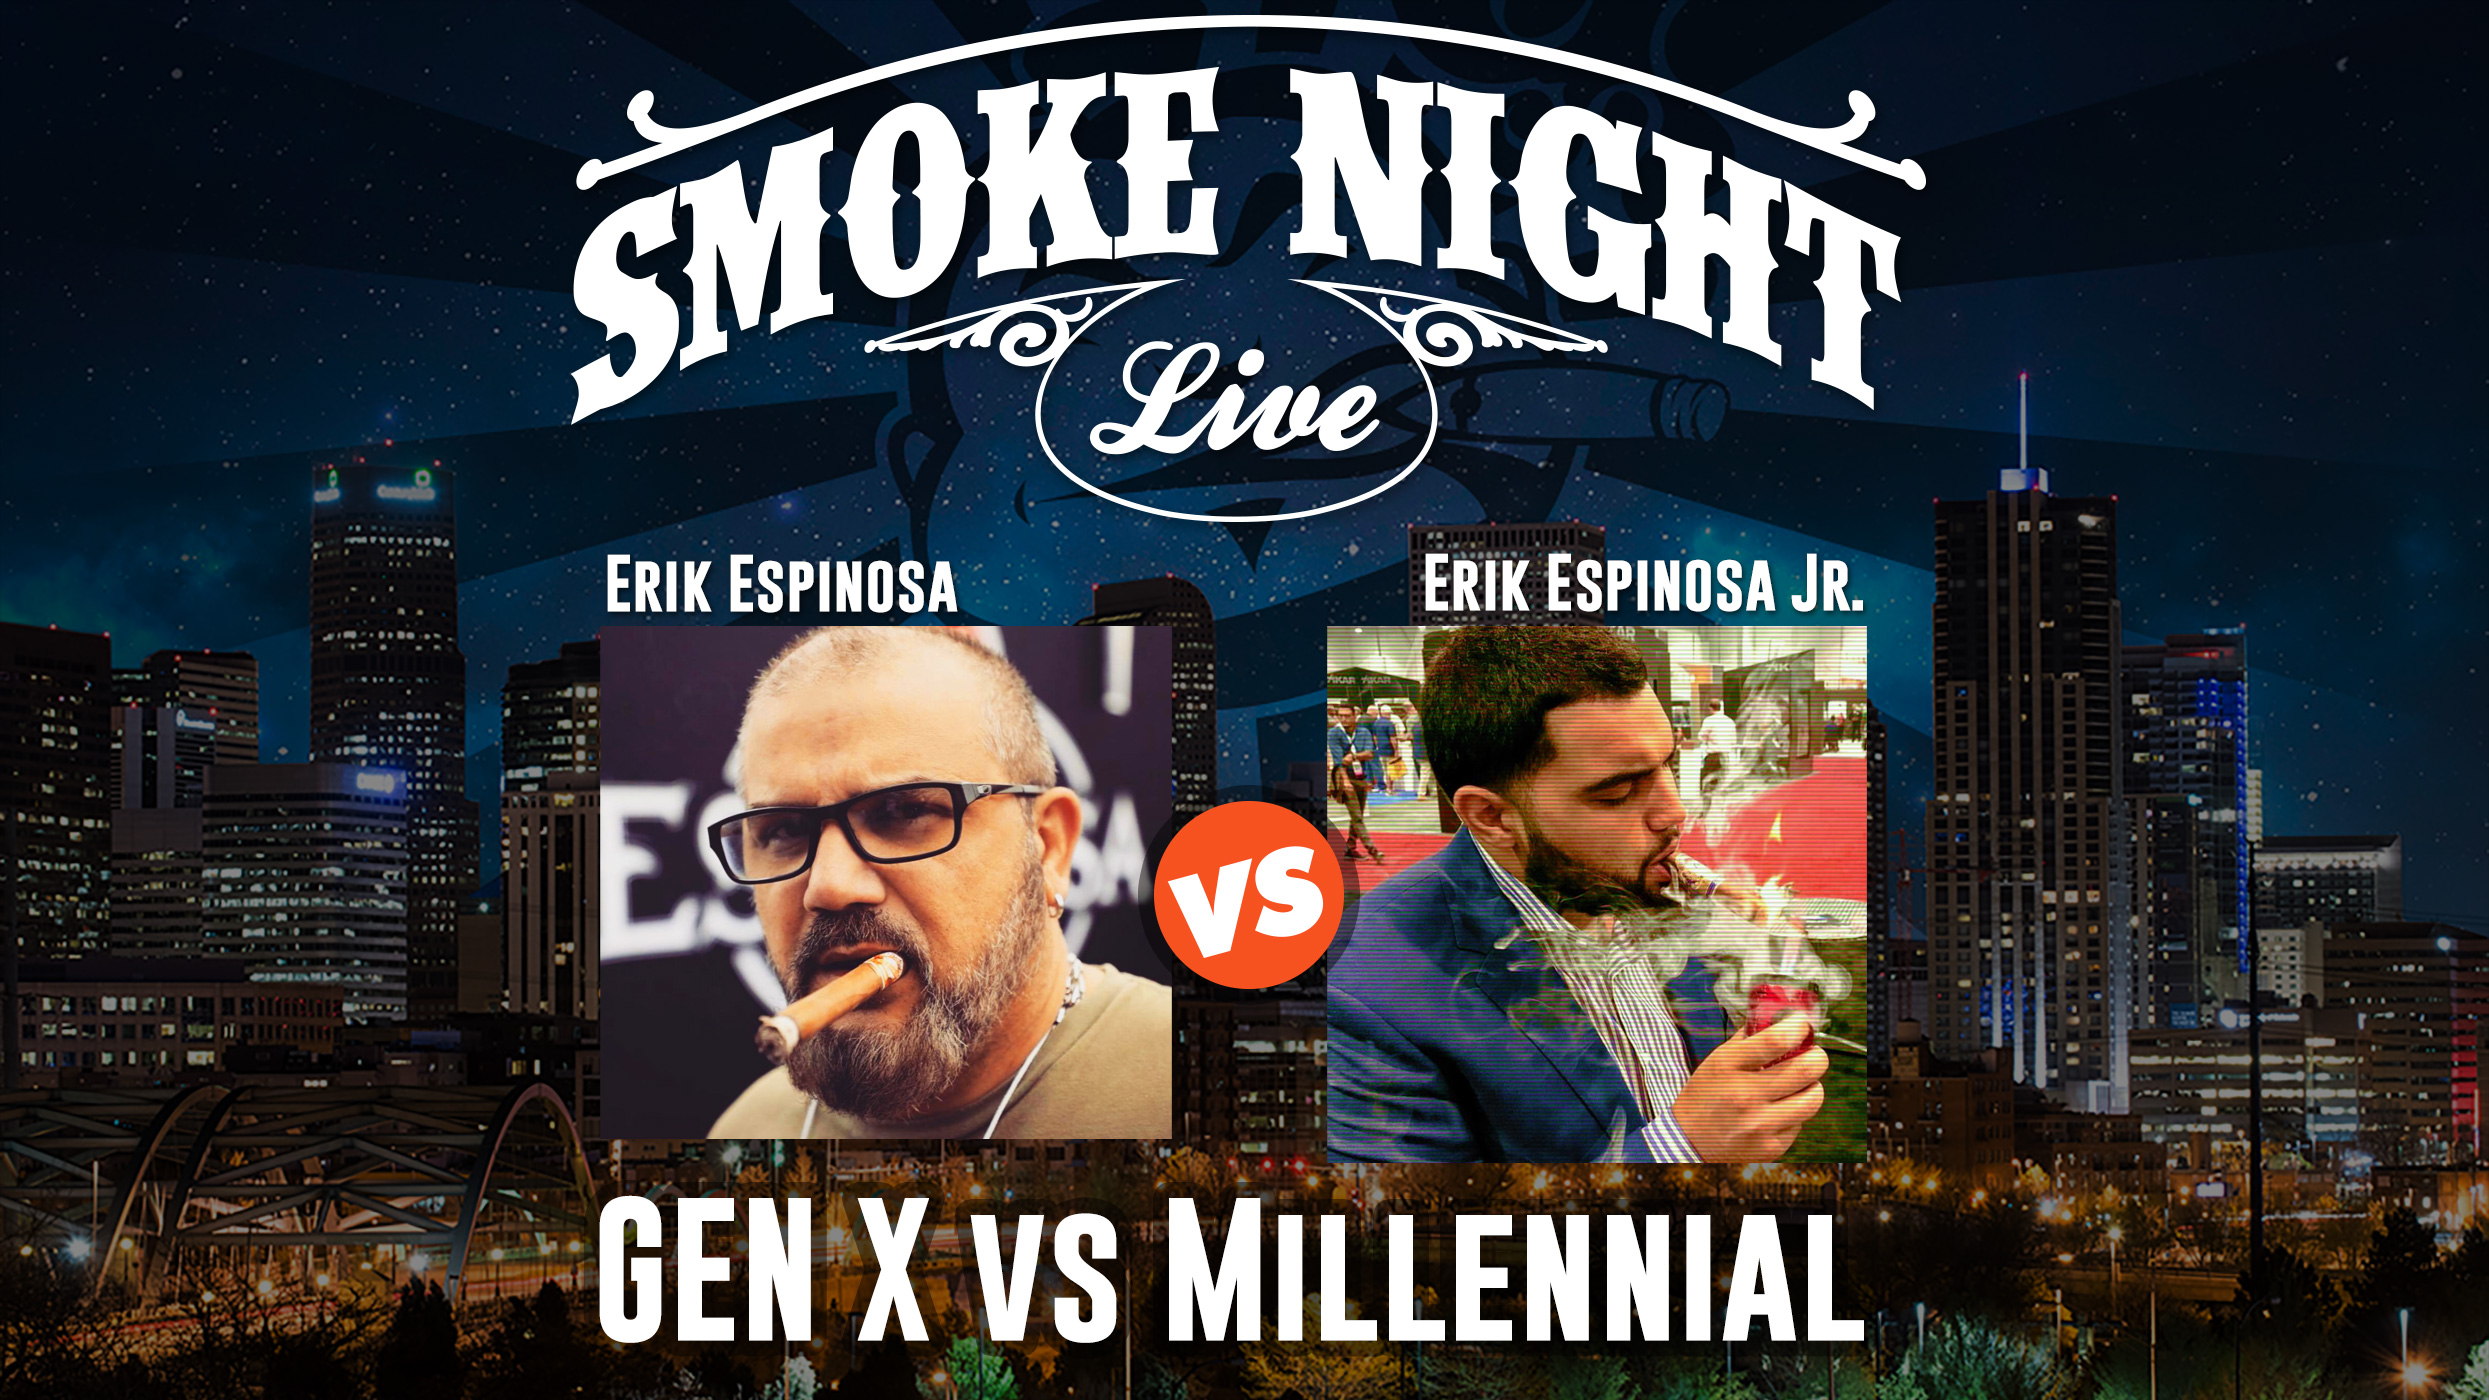 Erik Espinosa cigars interview